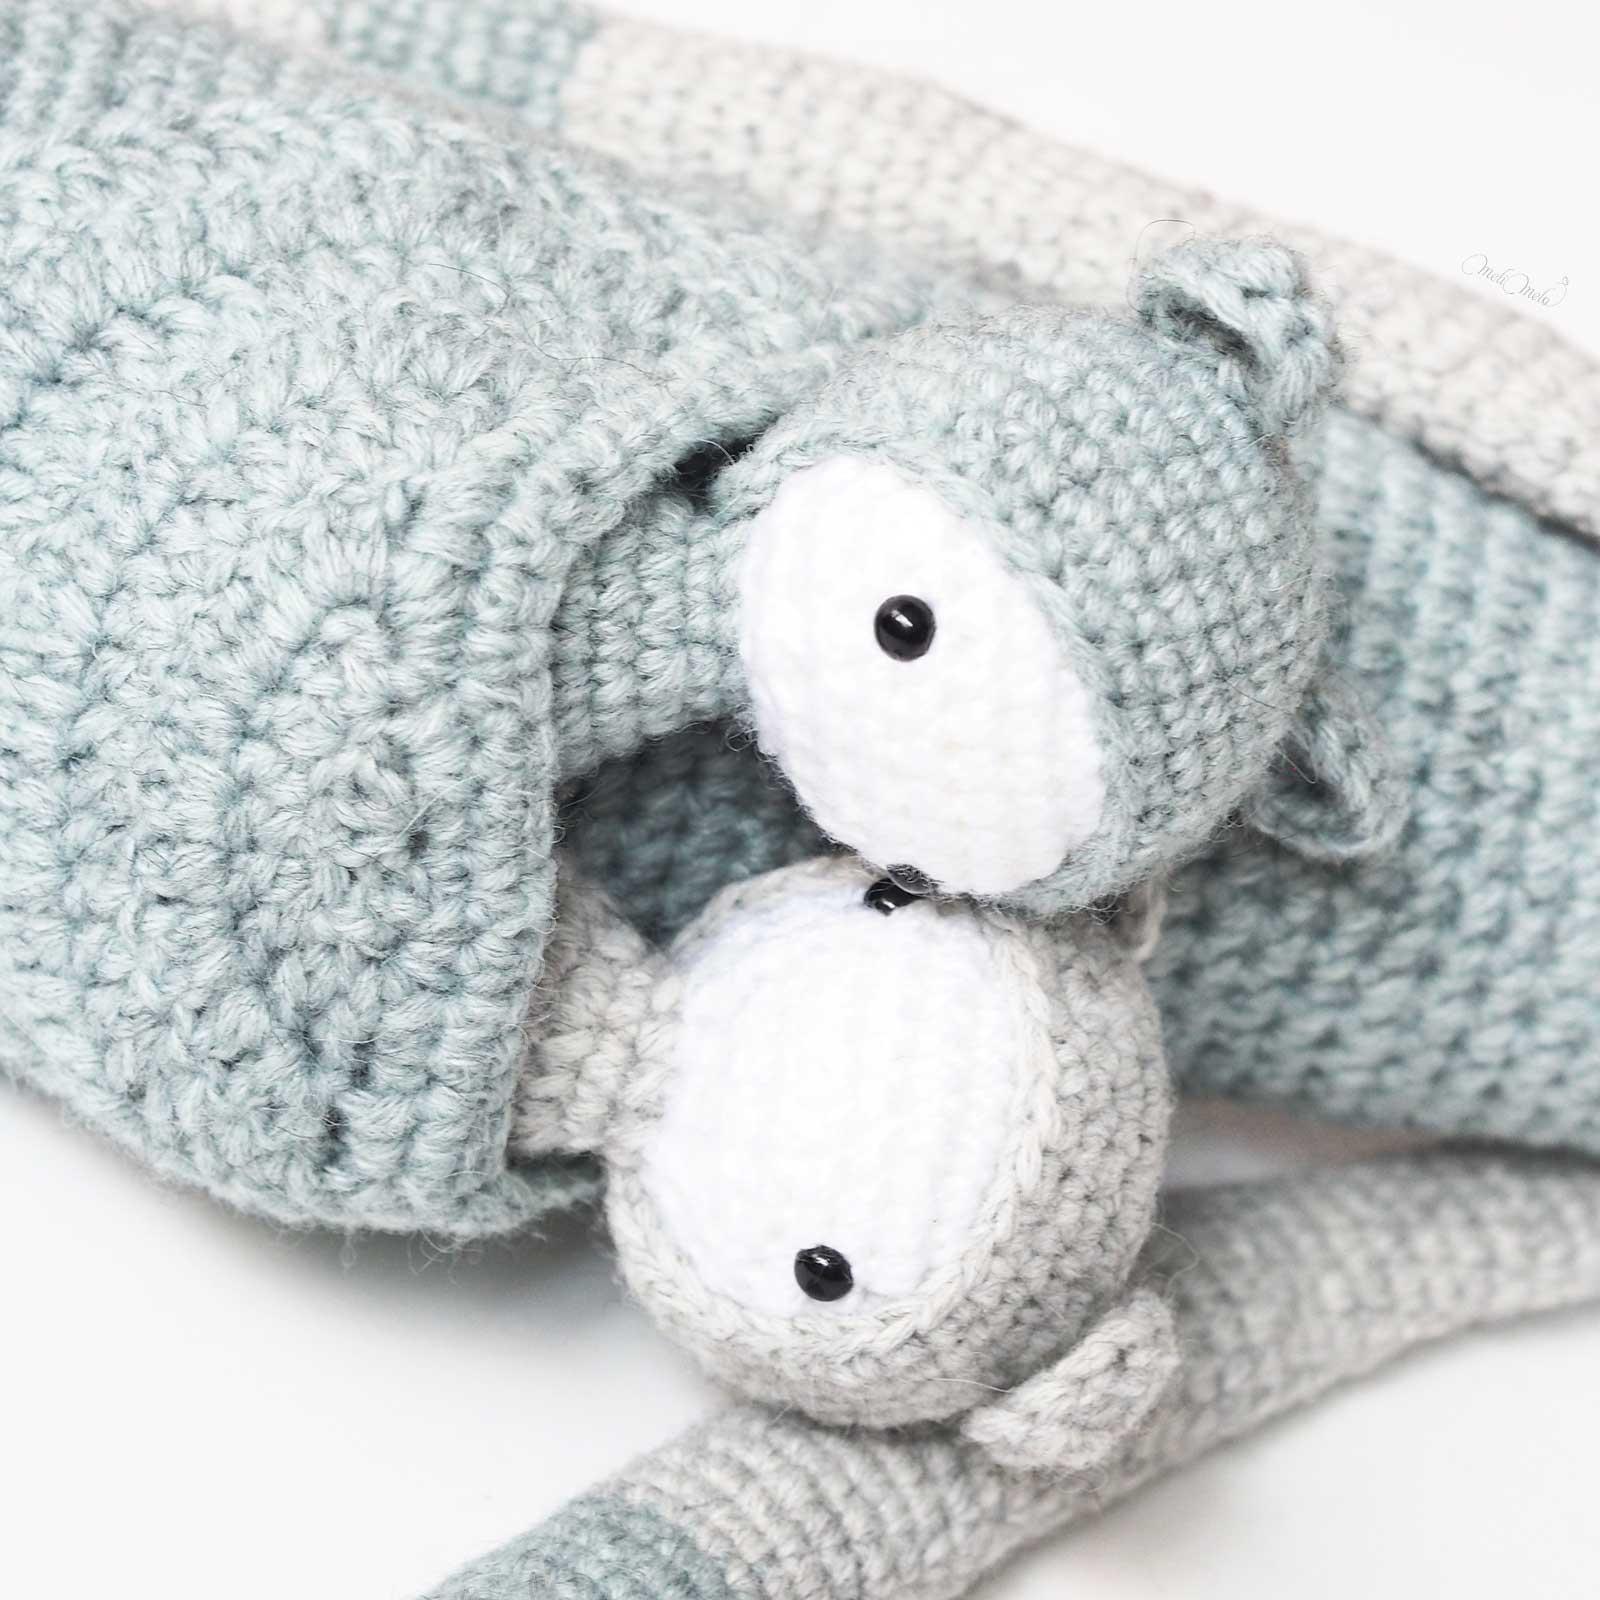 crochet jumeaux kangourous Kira Lalylala alpaca ricodesign laboutiquedemelimelo